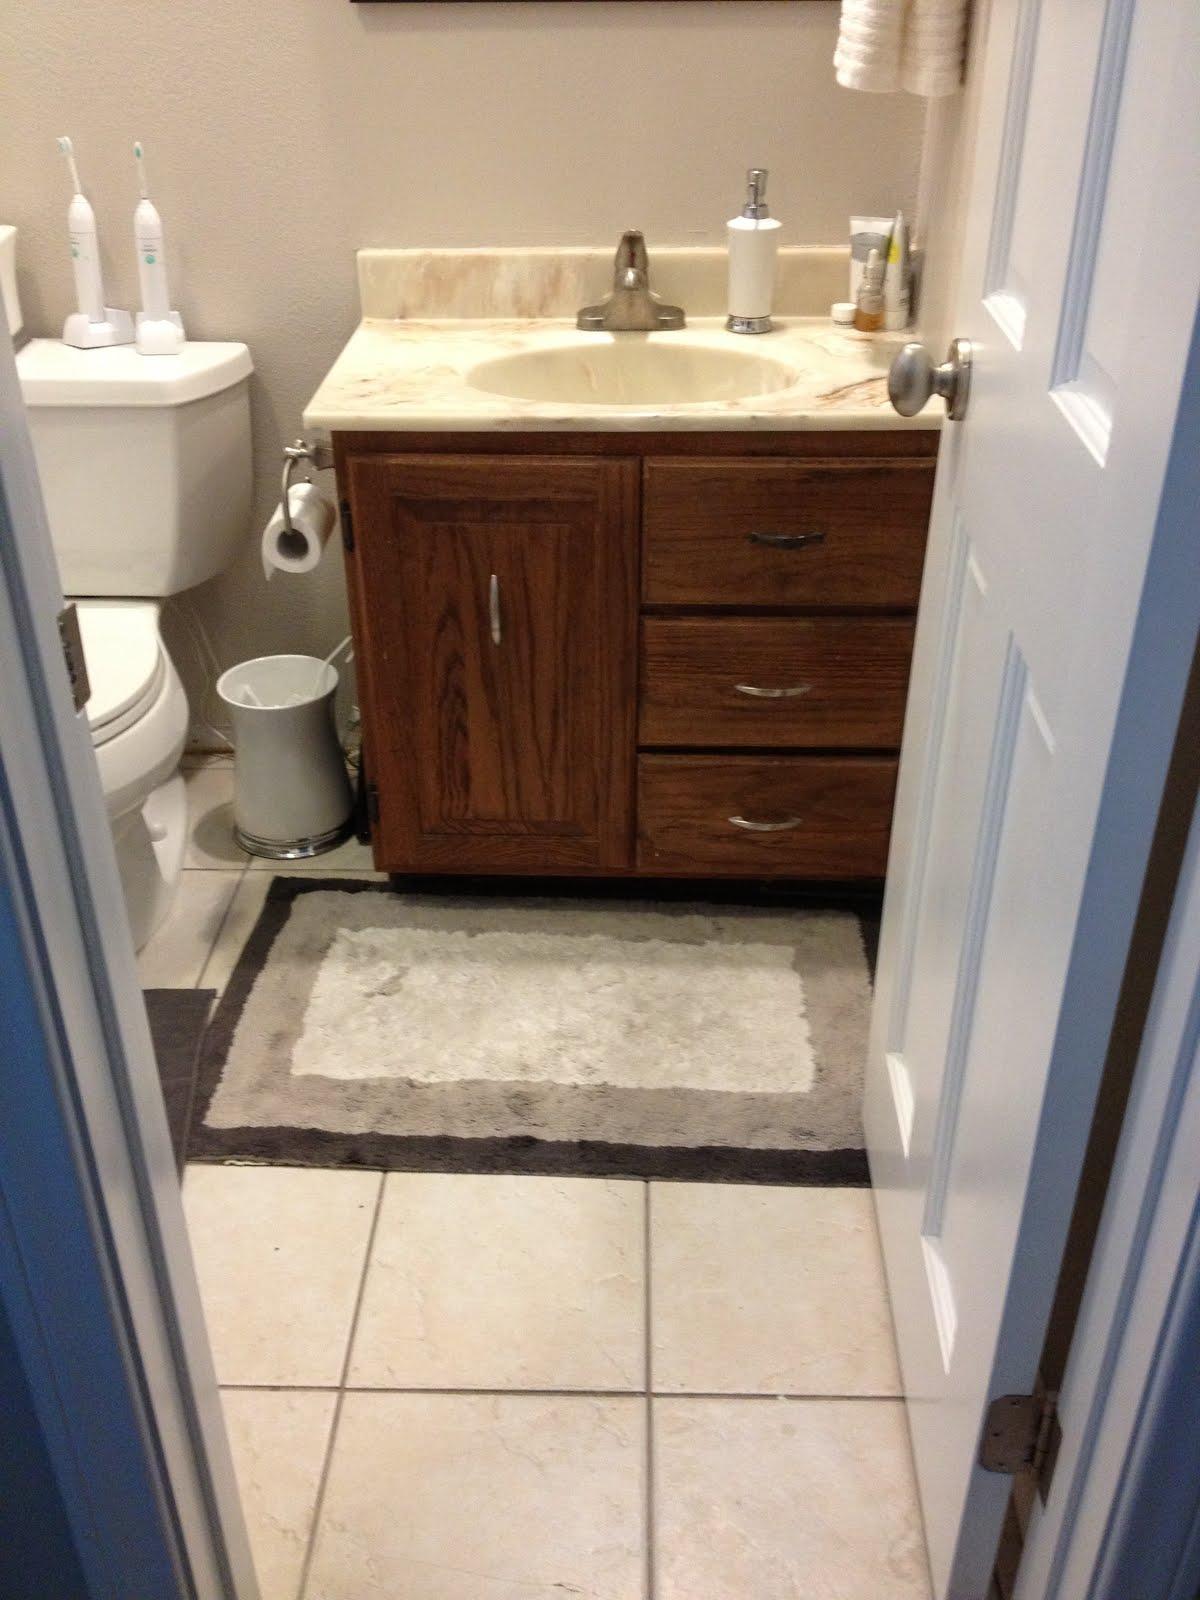 The Everyday Cinderella Replace Your Bathroom Vanity